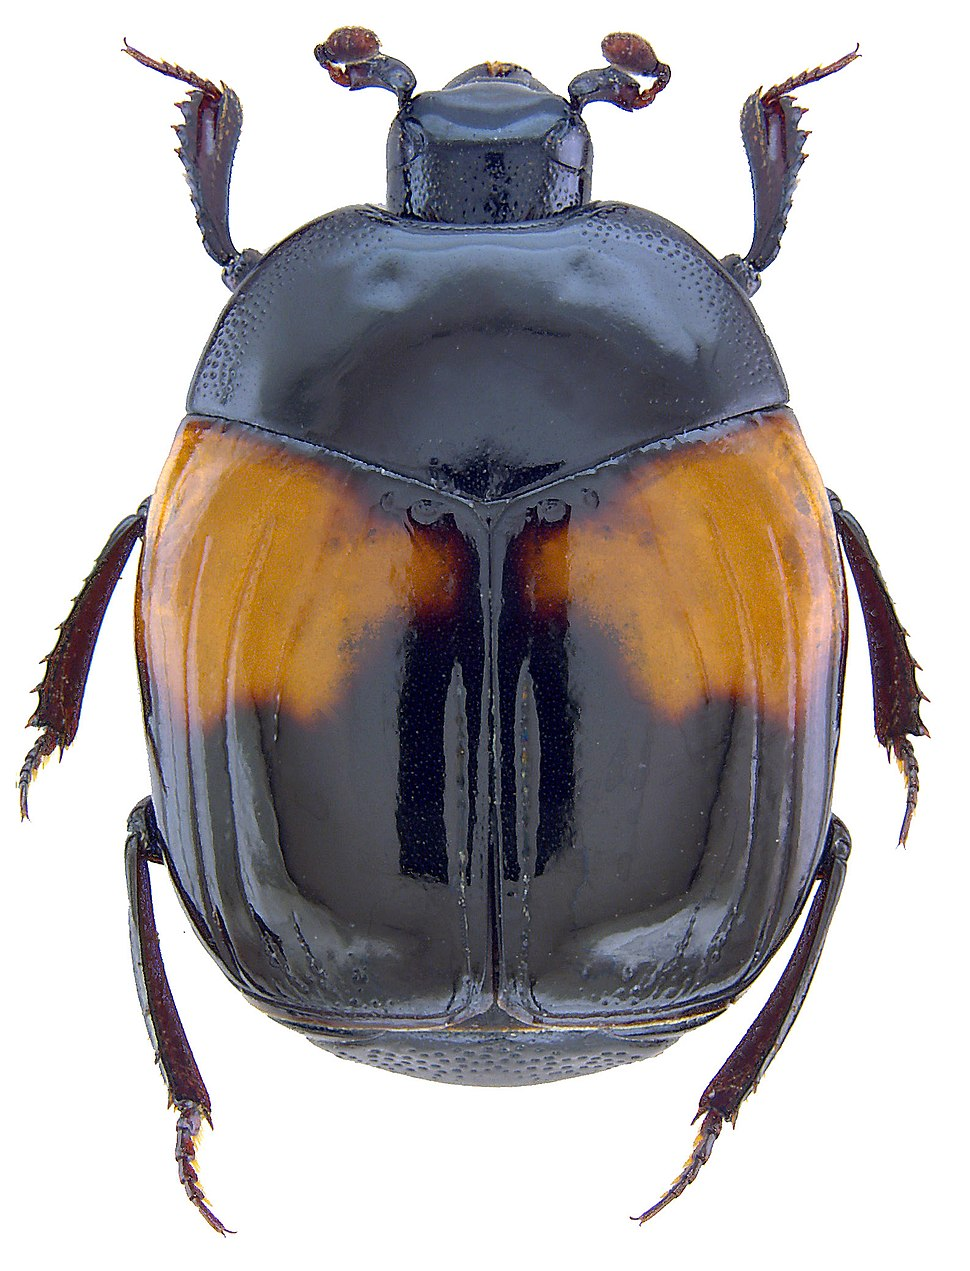 Asolenus julietteae Gomy, 2014